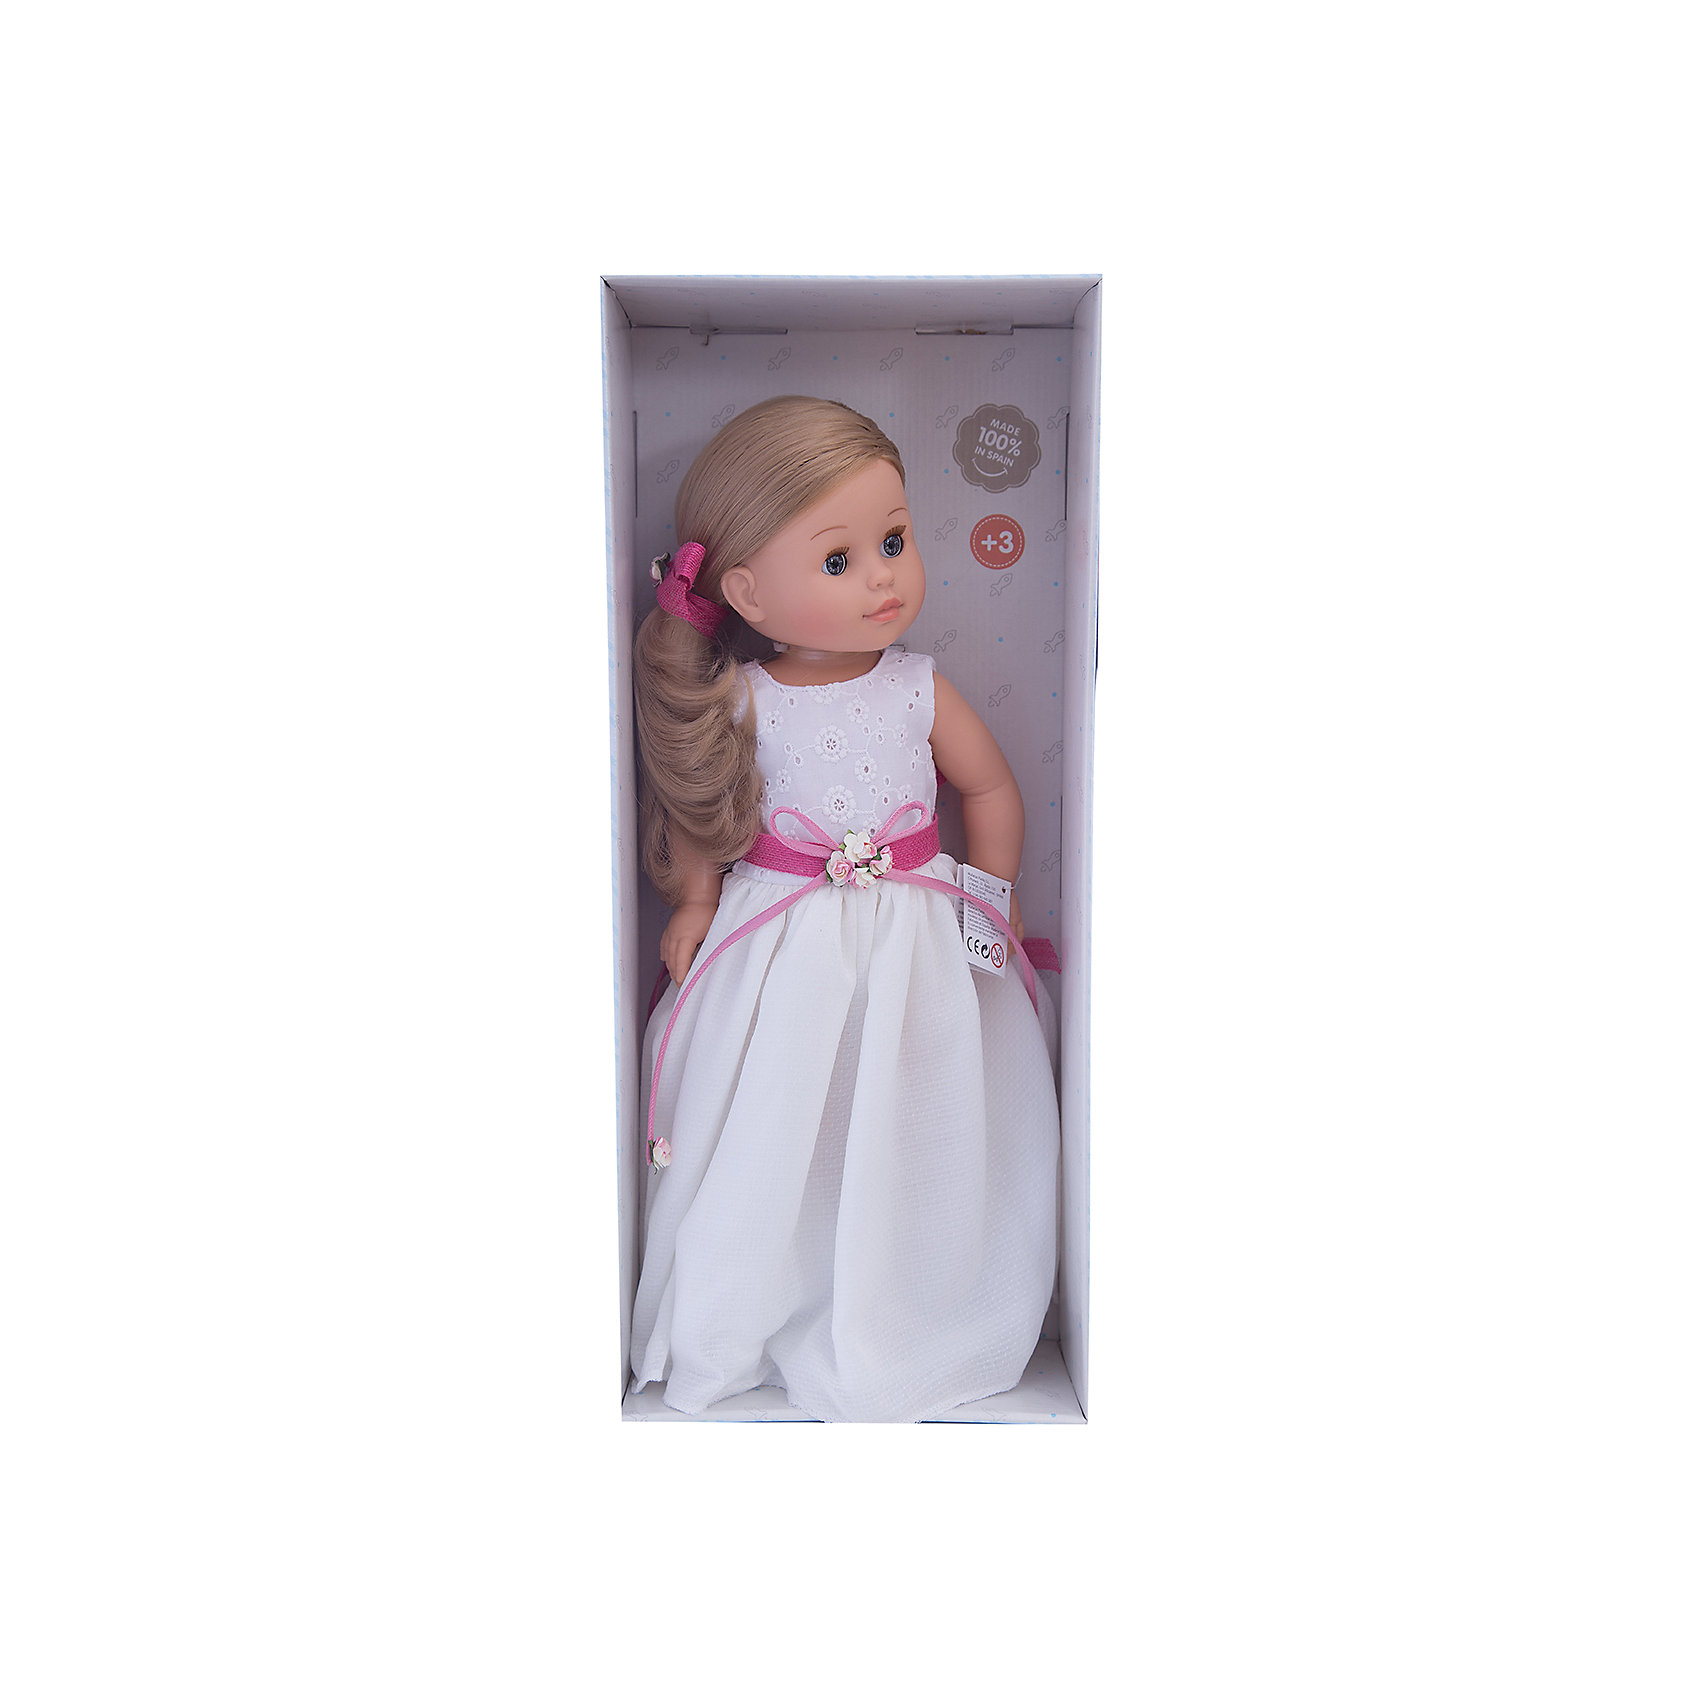 цена Paola Reina Кукла Эмма, 42 см, Paola Reina онлайн в 2017 году